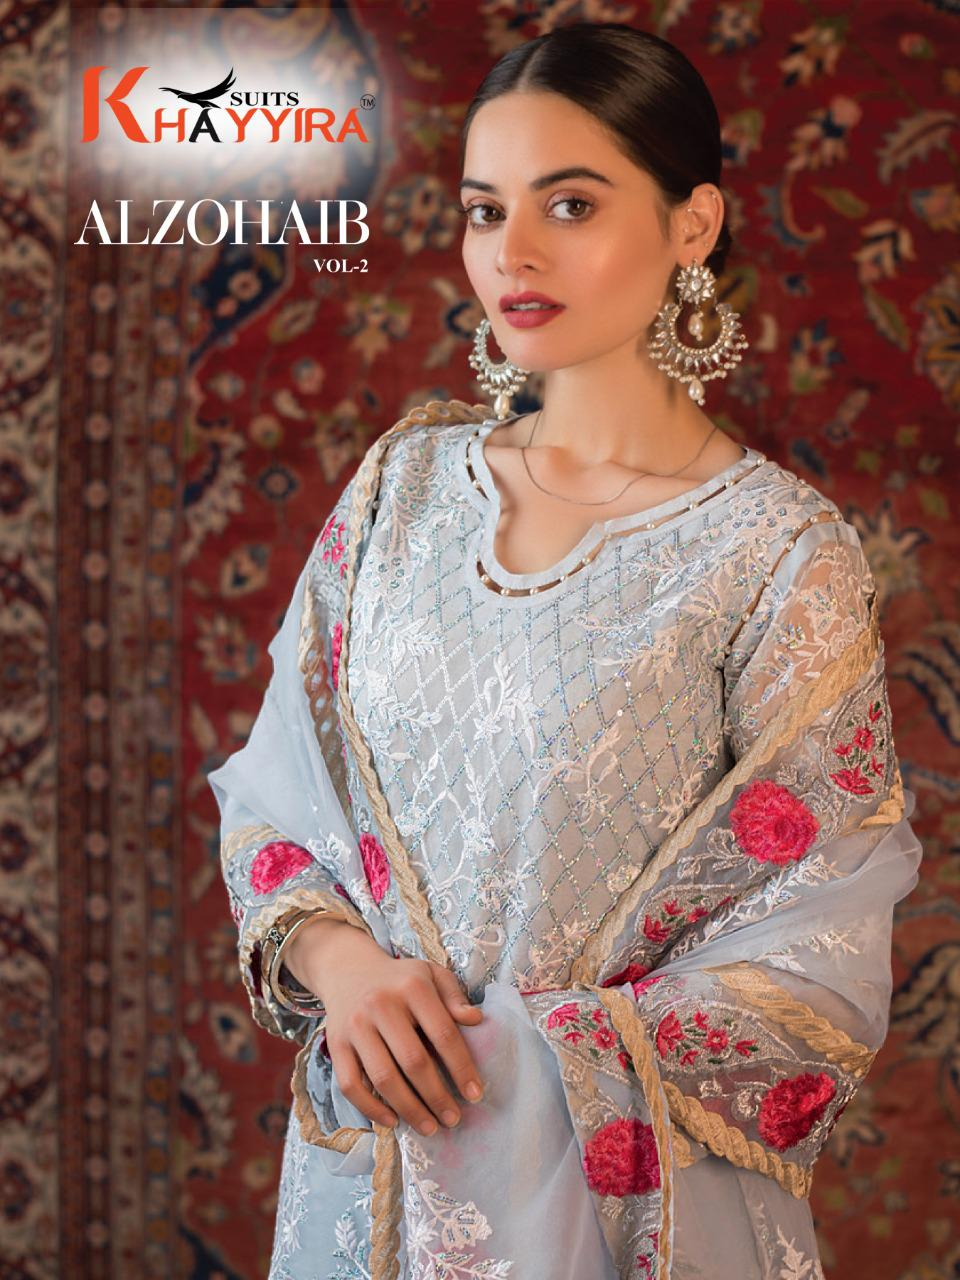 Khayyira Alzohaib Vol 2 Salwar Suit Wholesale Catalog 4 Pcs 1 - Khayyira Alzohaib Vol 2 Salwar Suit Wholesale Catalog 4 Pcs